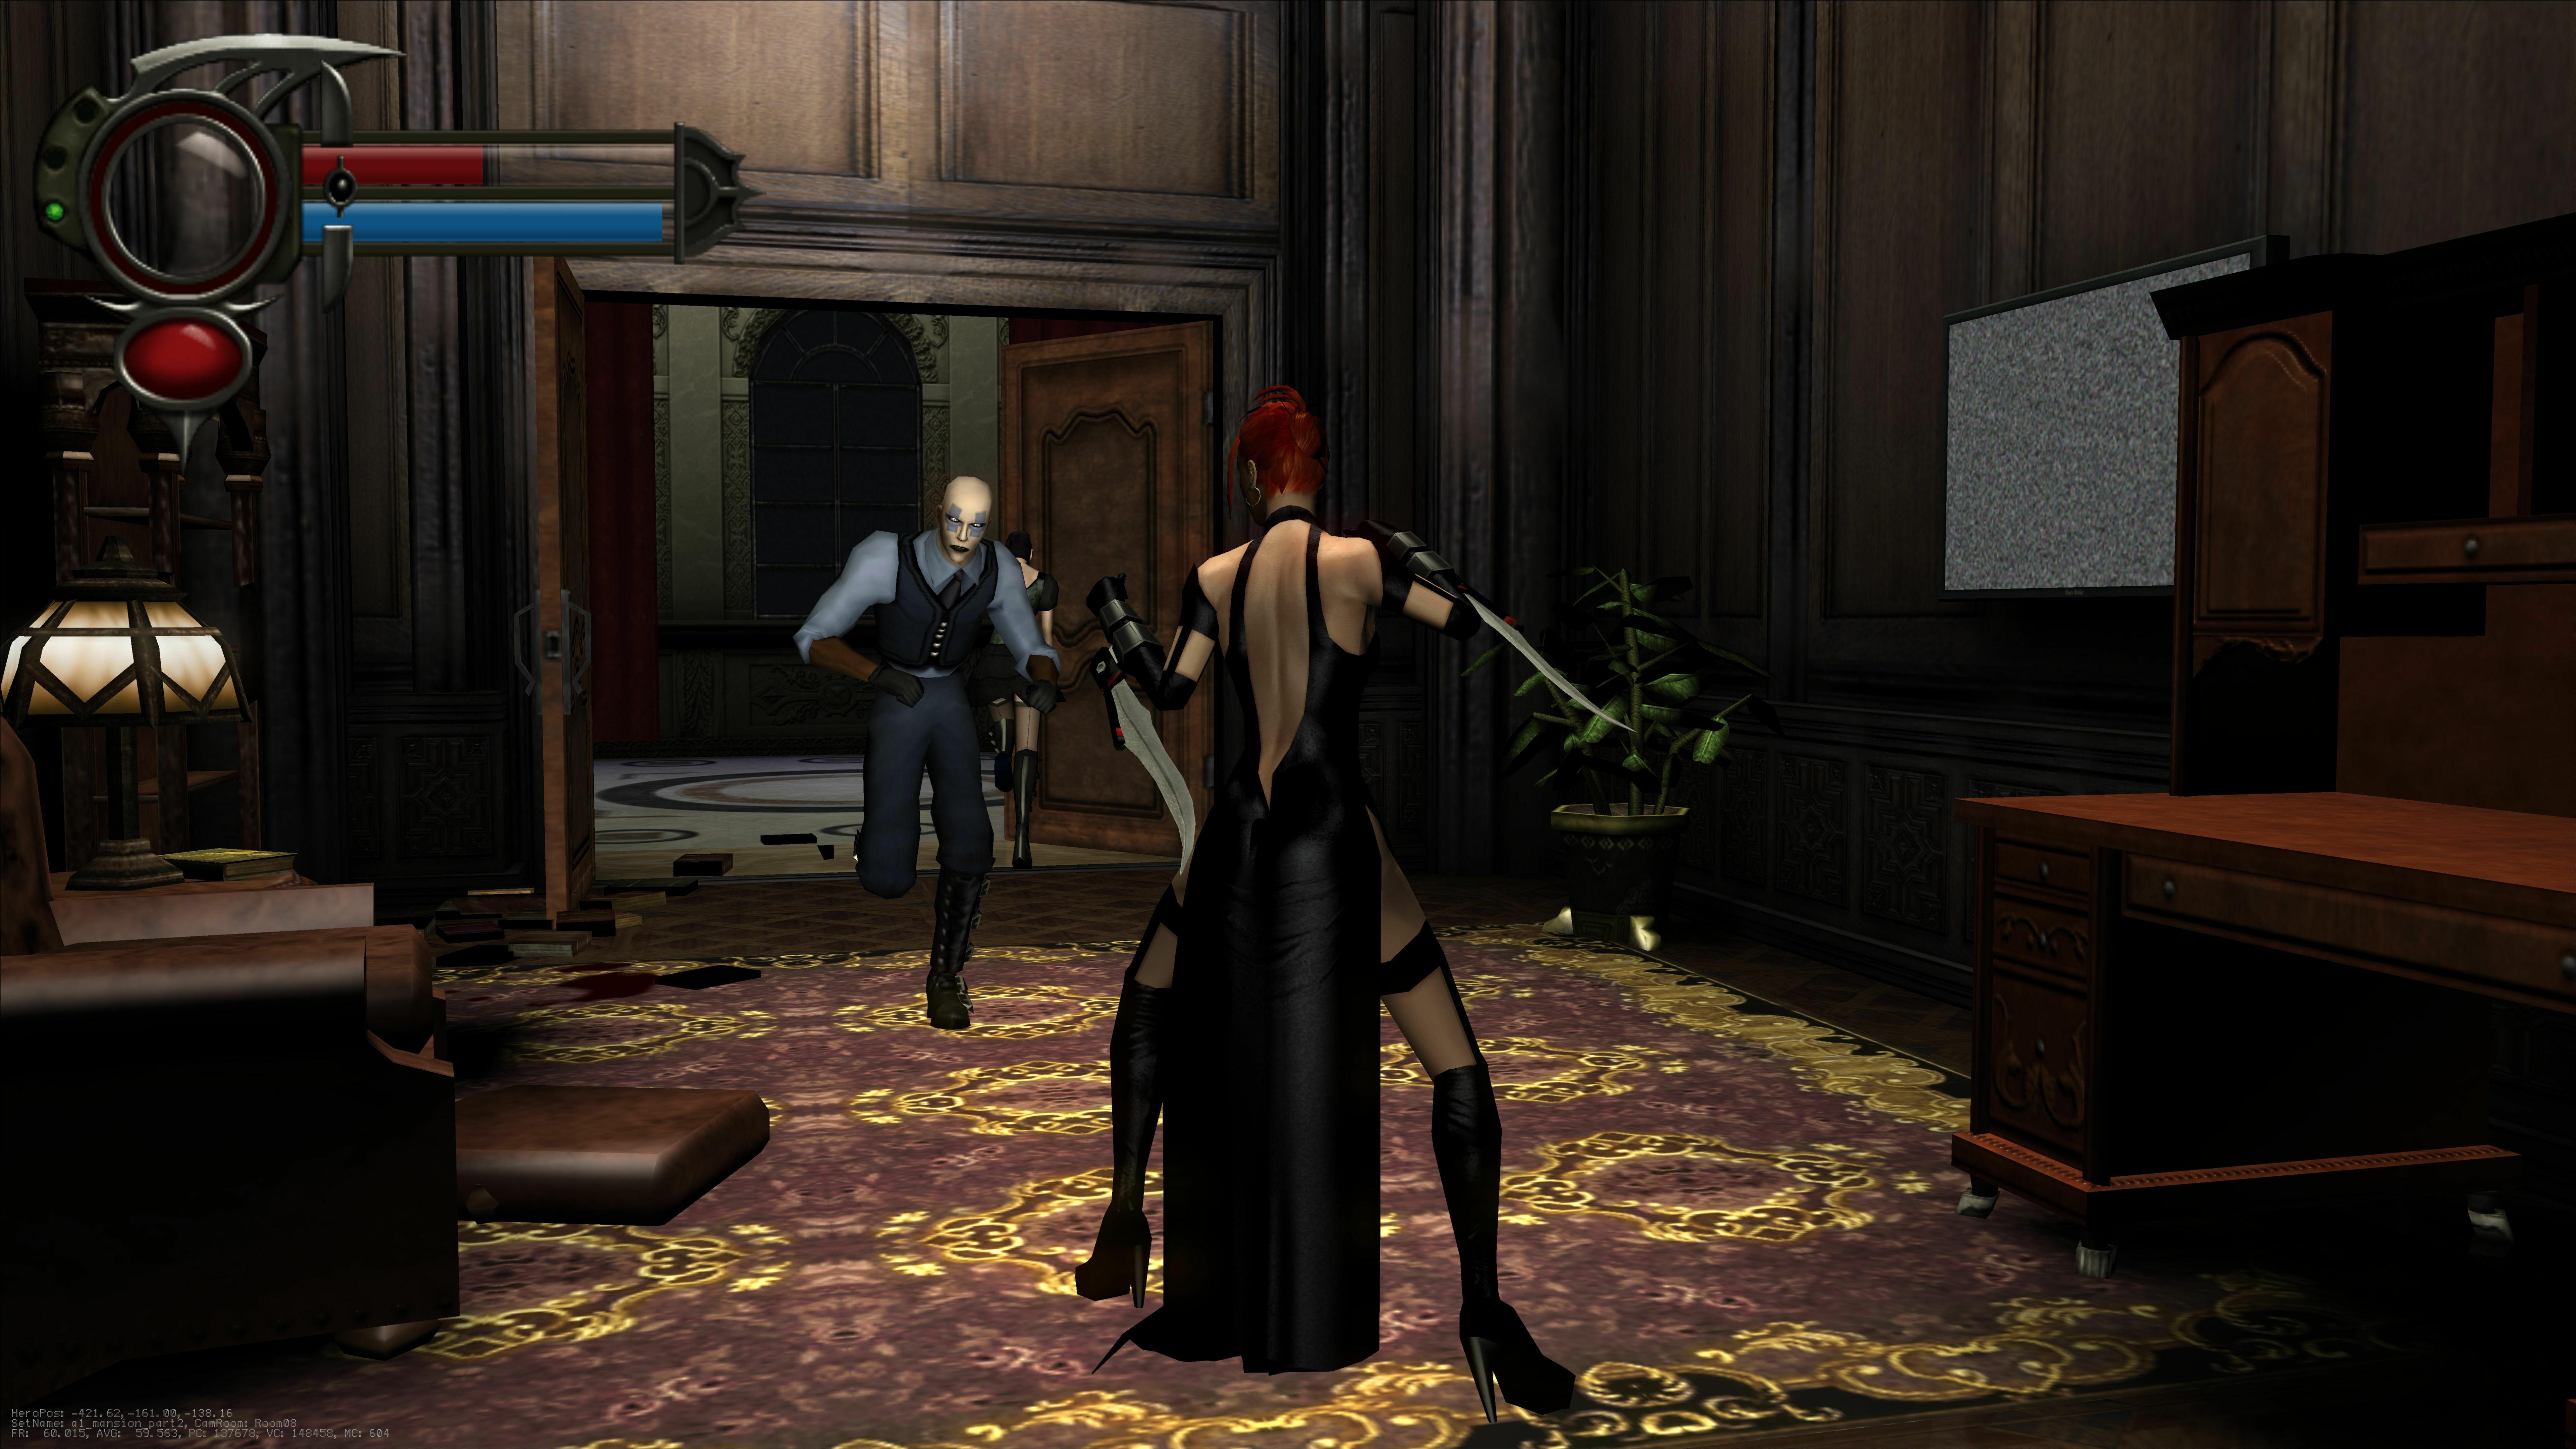 BloodRayne 2: Terminal Cut screenshot 3